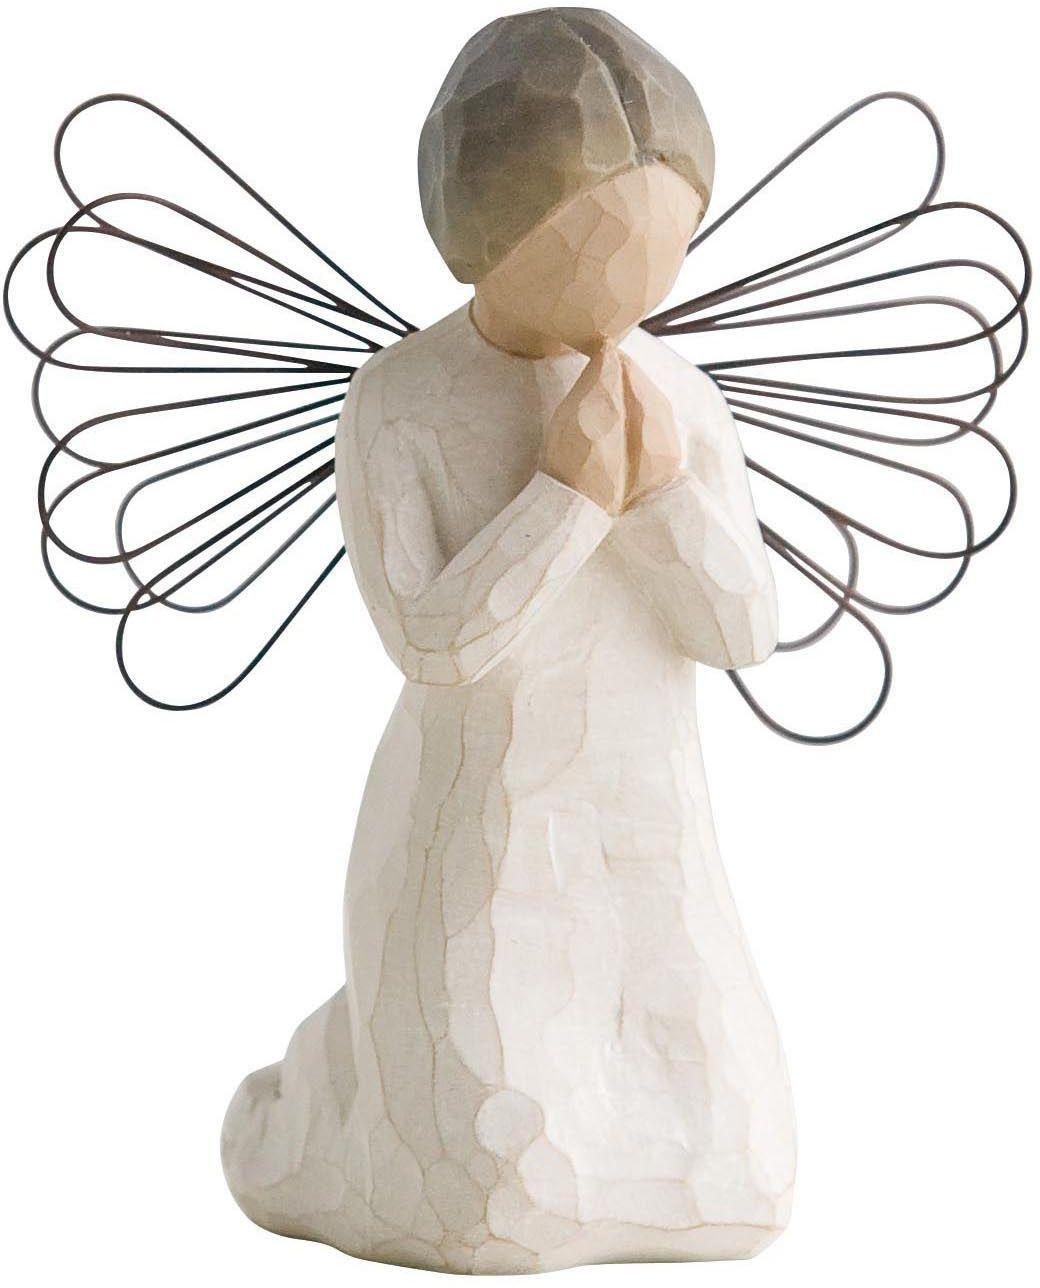 Willow Tree - Angel of Prayer - Figurine lowest price